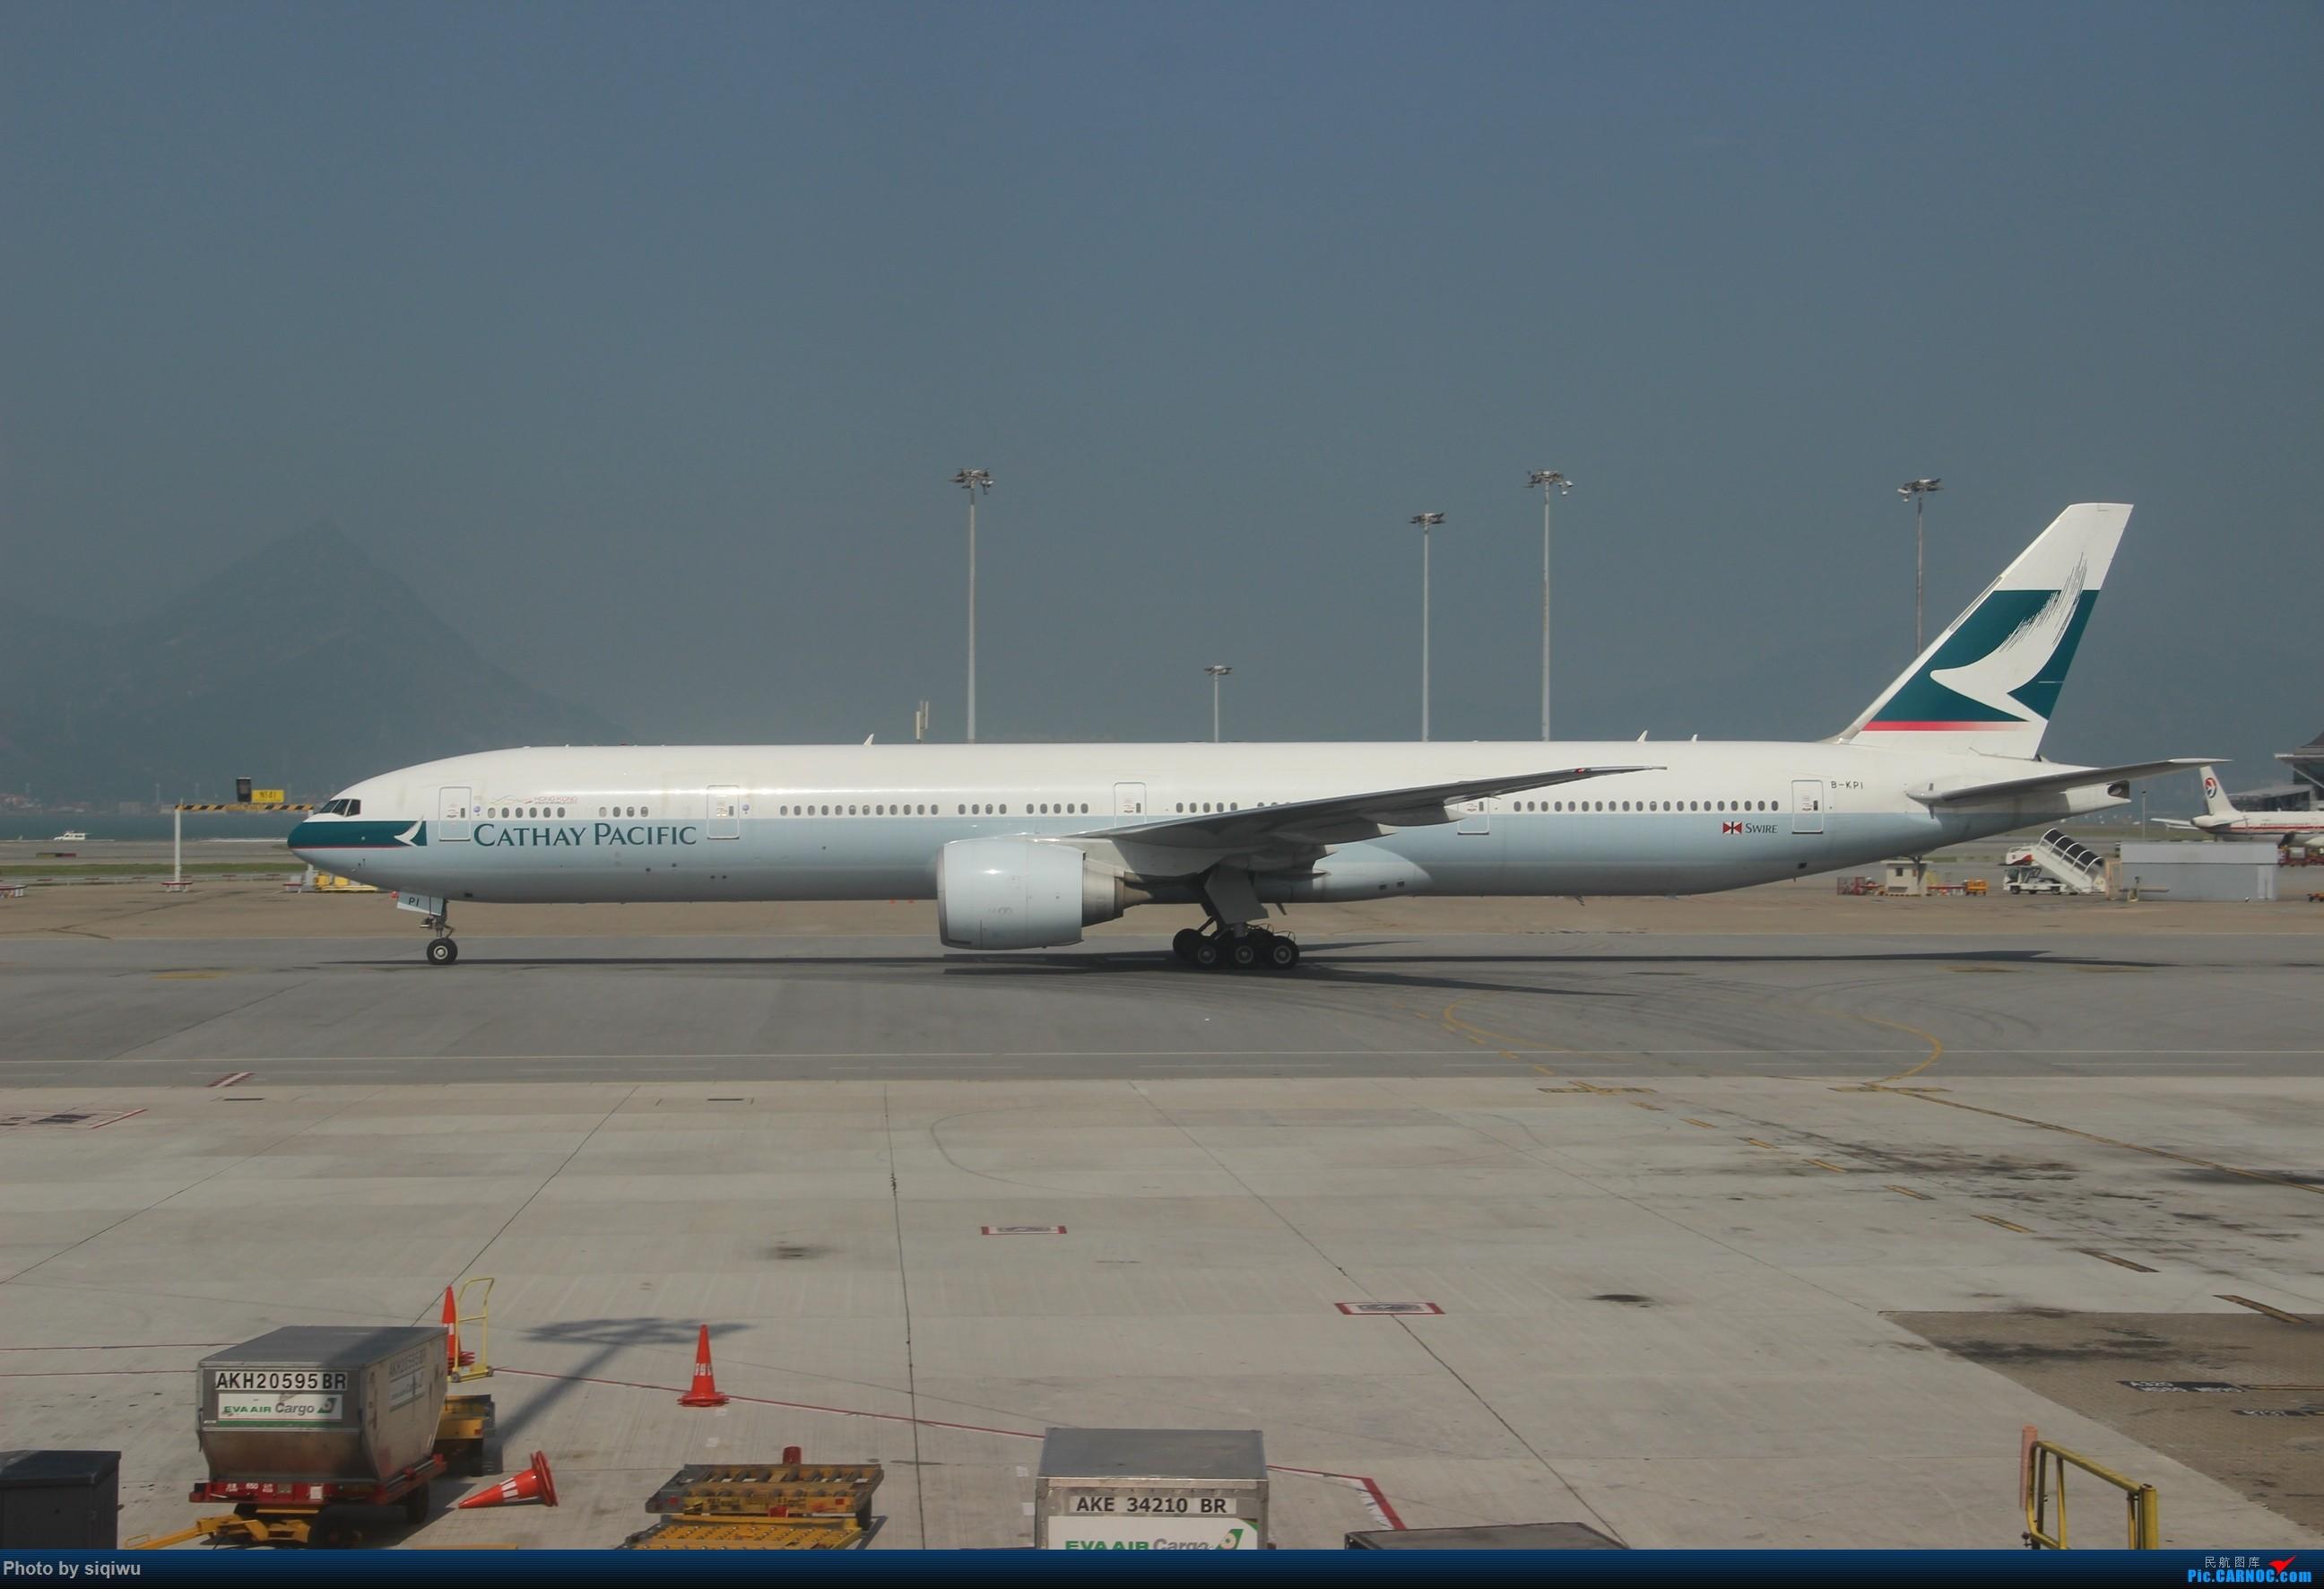 Re:[原创]PVG-HKG-KUL-HKG-PVG 四天往返,CX/KA BOEING 777-300ER  中国香港国际机场